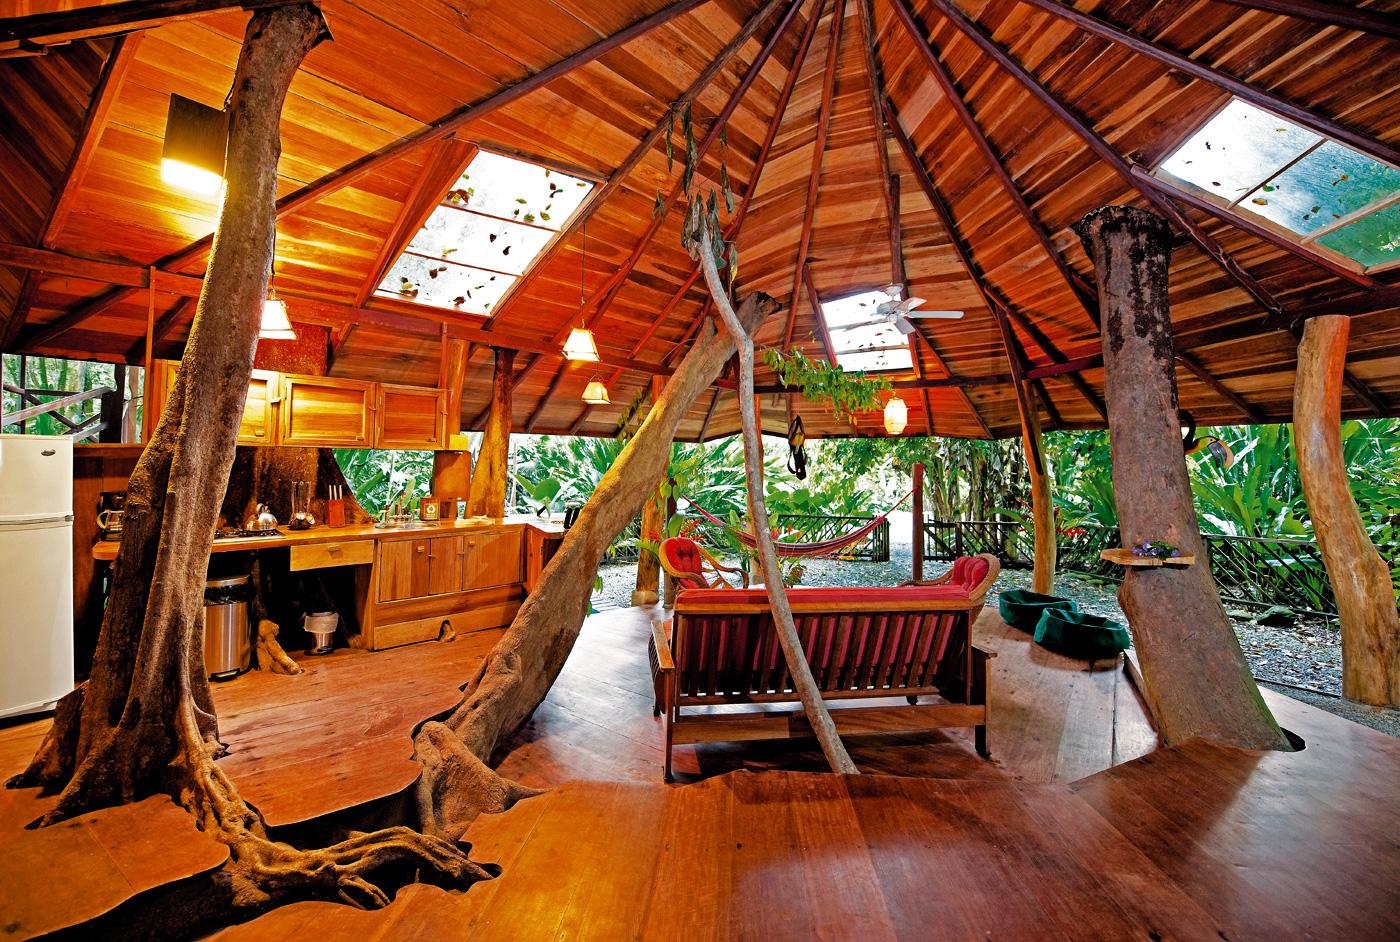 Image property of Tree House Lodge